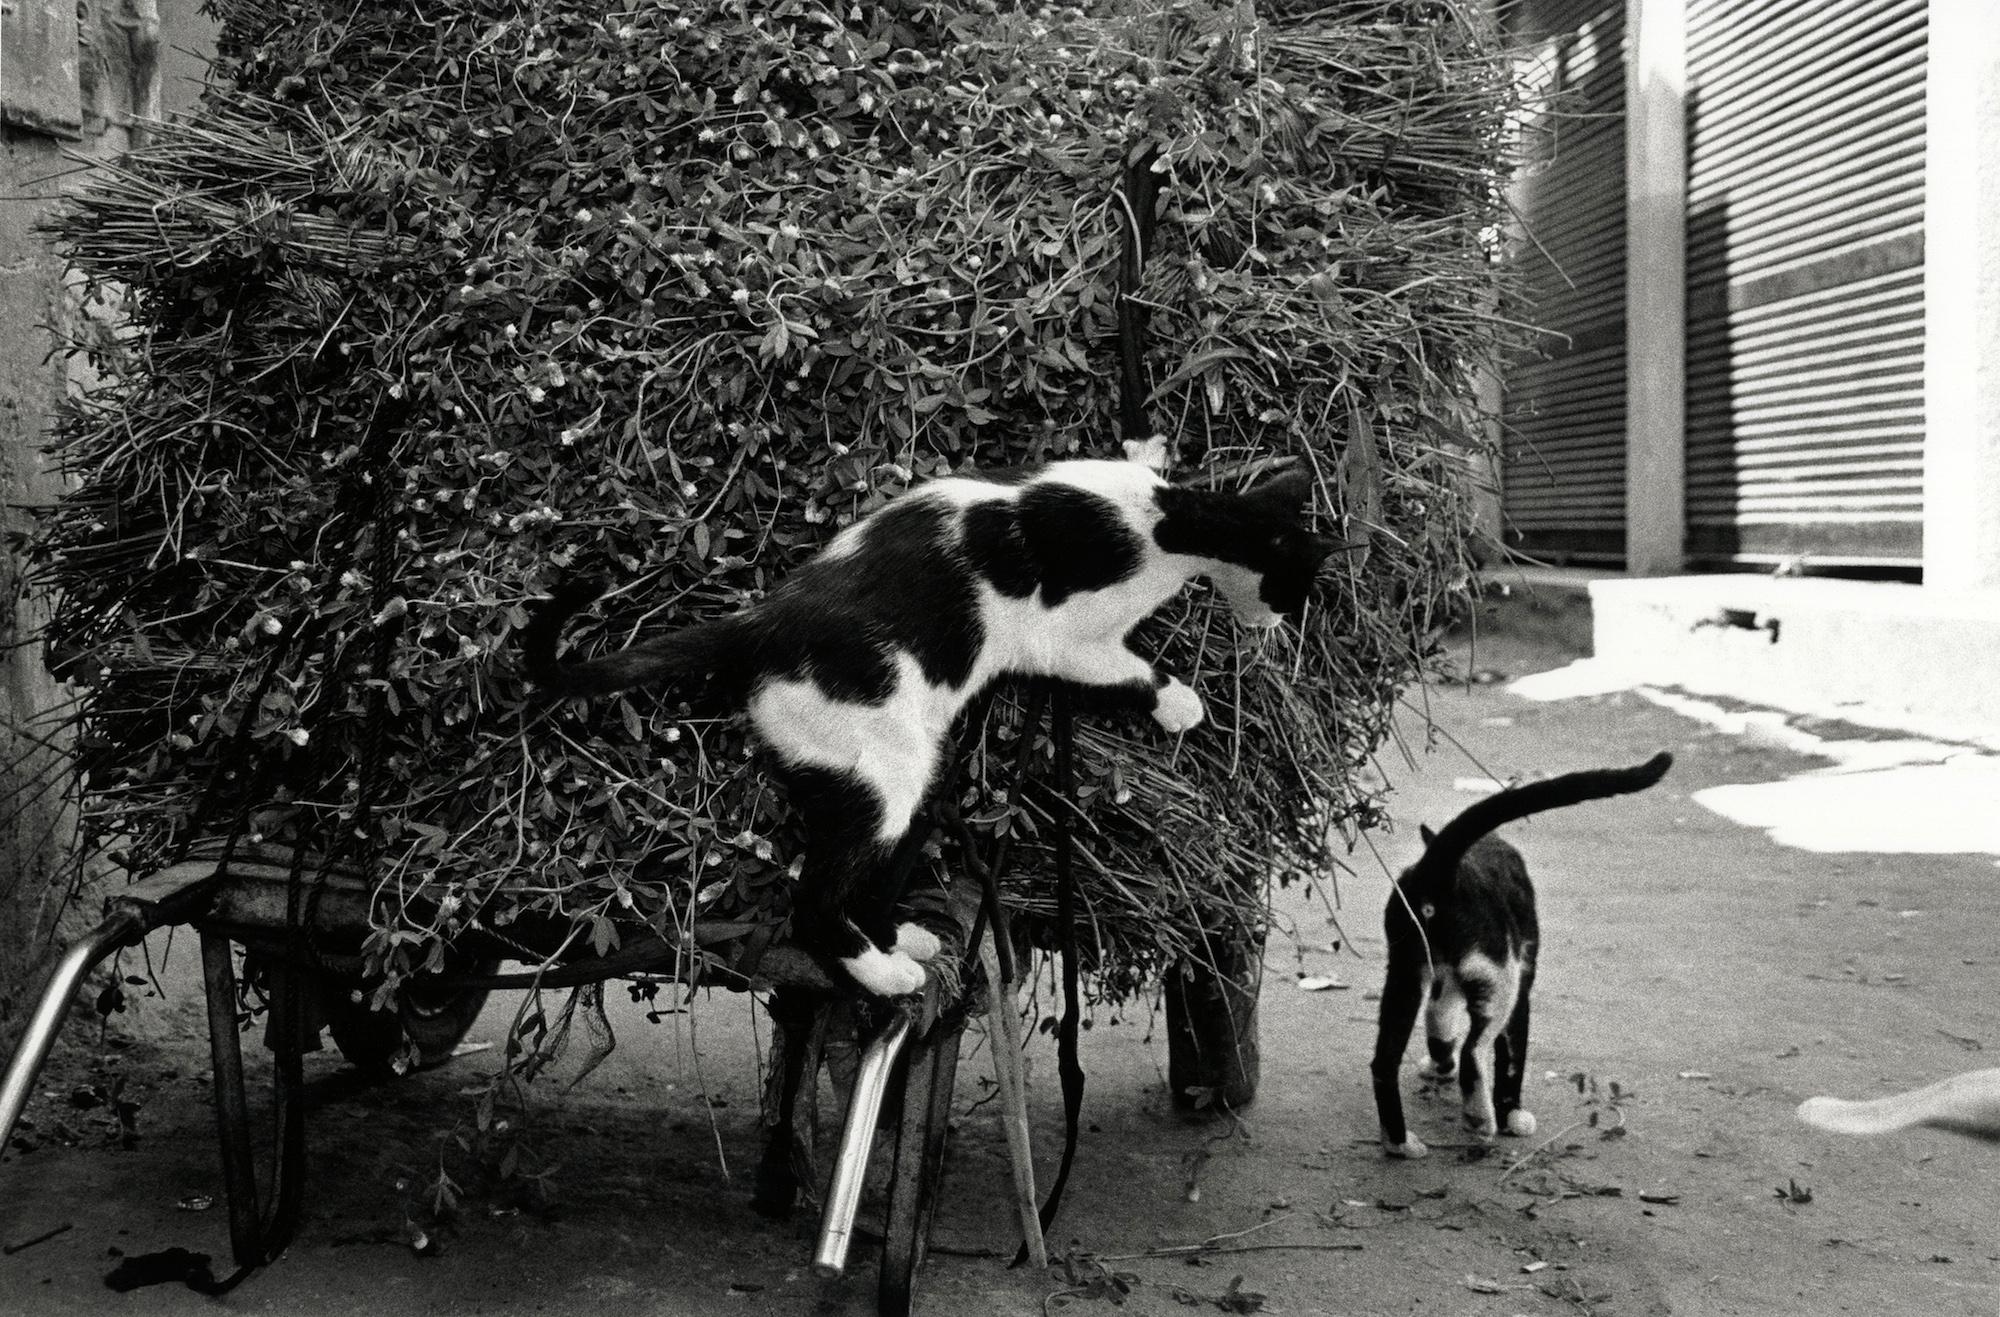 walter_rothwell_photography_cats-08.jpg